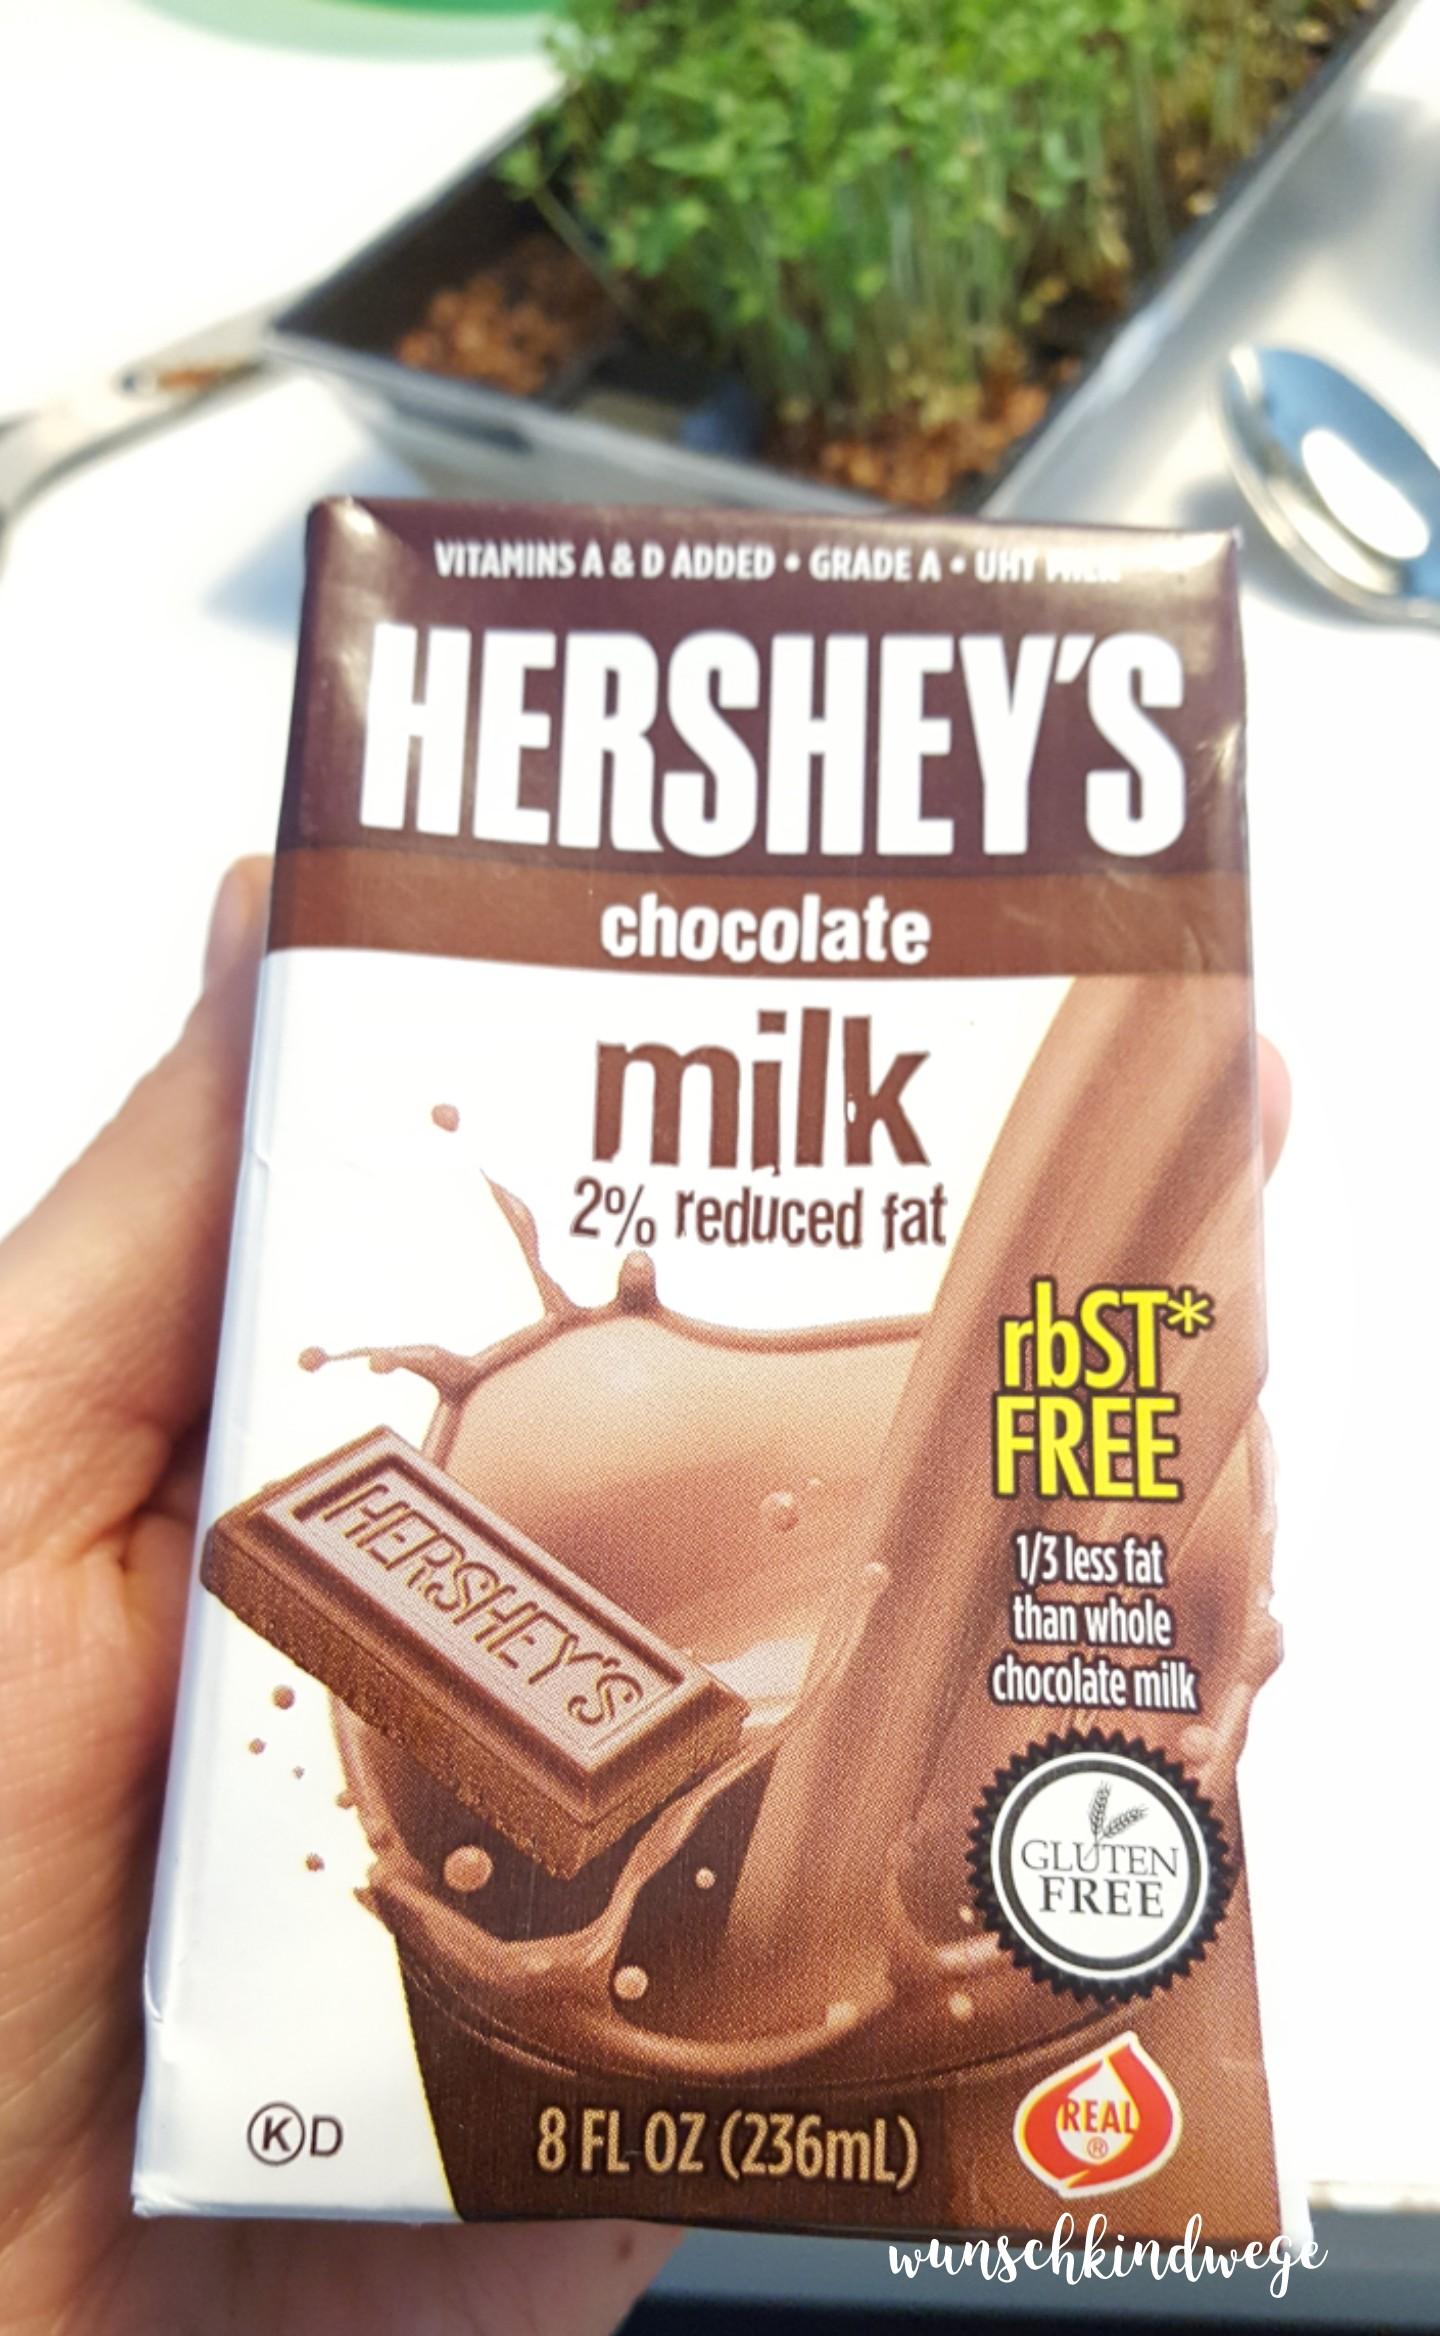 Osterwochenende in Bildern: Hershey's Kakao